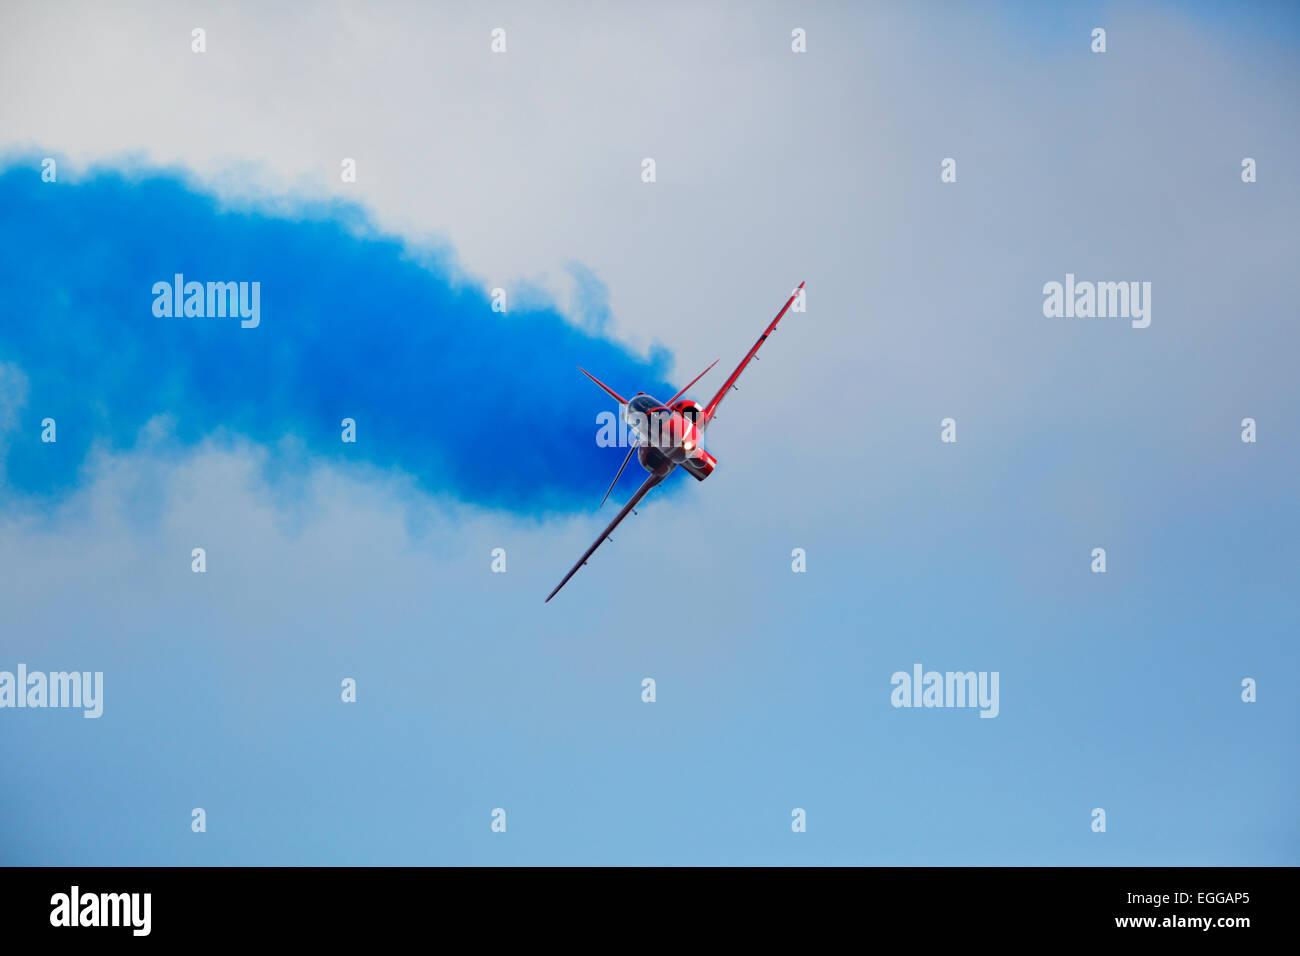 Red Arrows at Dawlish airshow - Stock Image